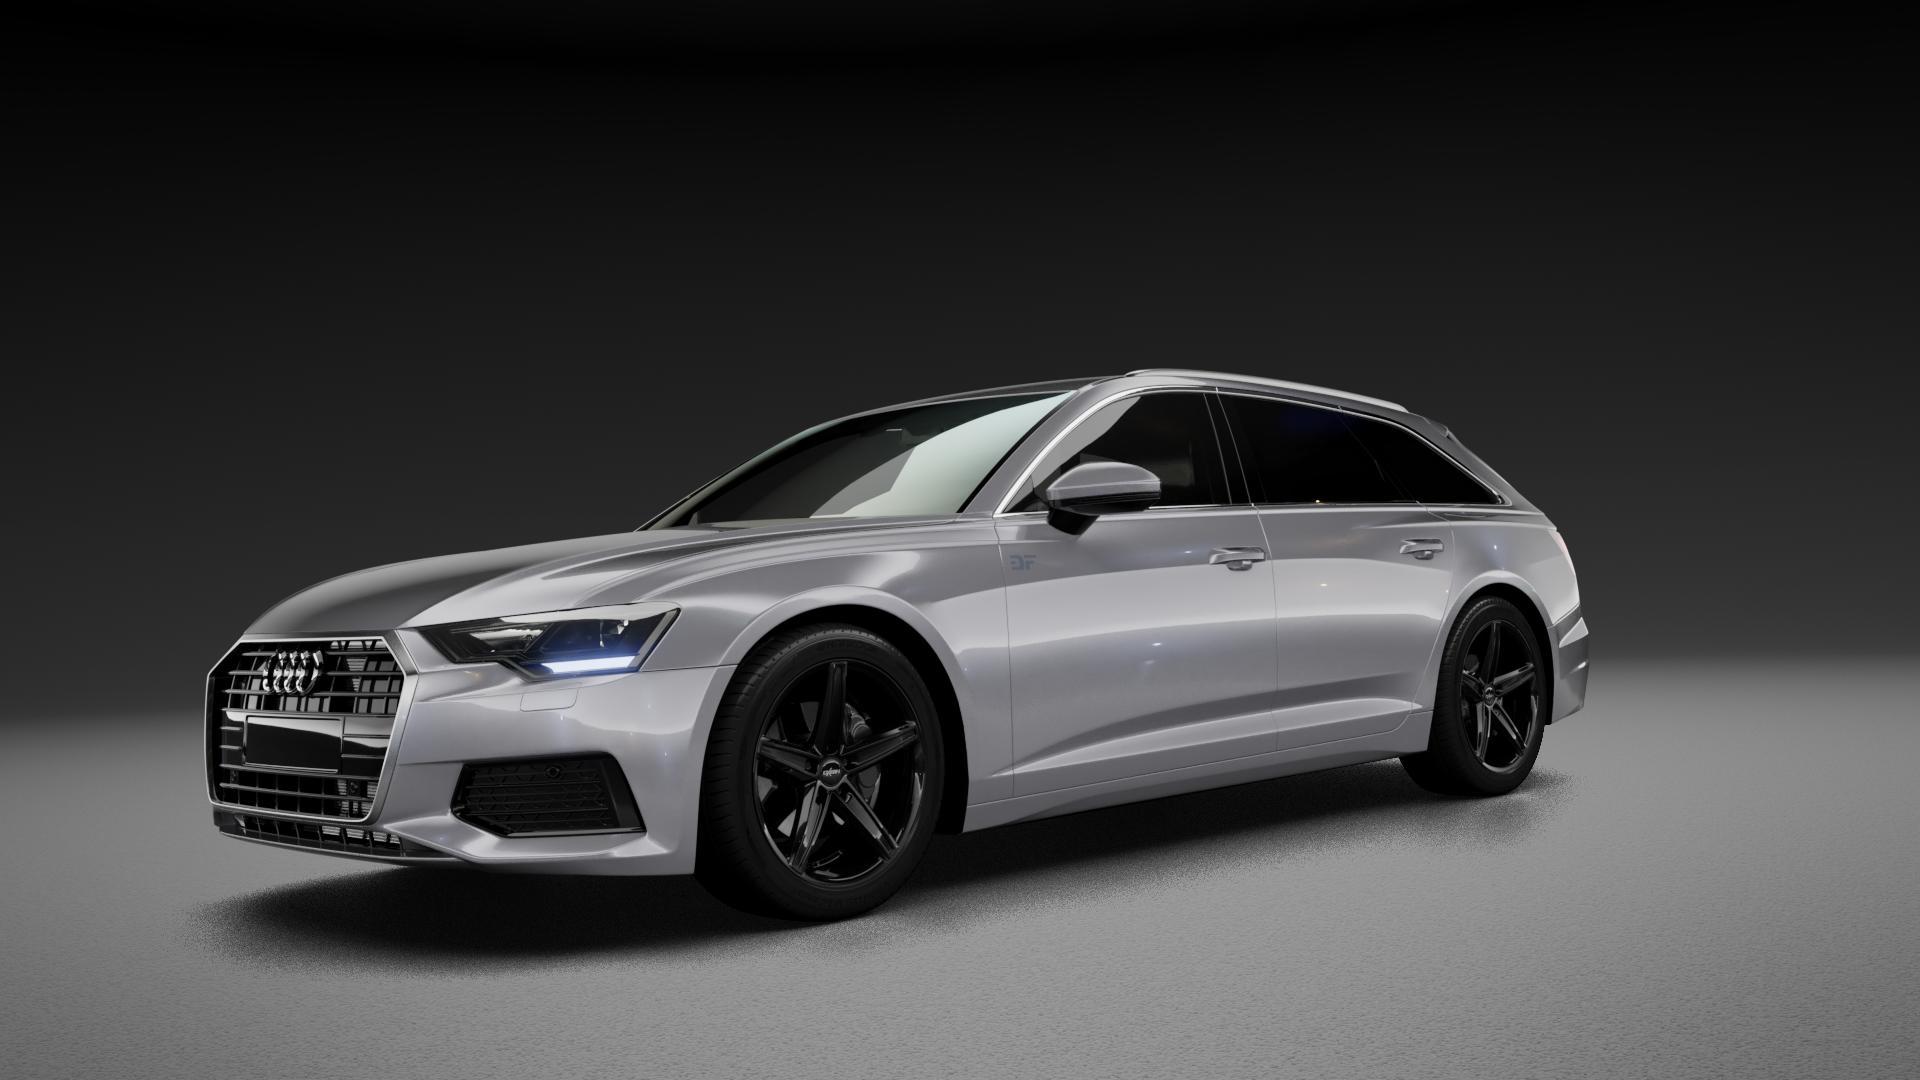 OXIGIN 18 Concave black Felge mit Reifen schwarz in 19Zoll Winterfelge Alufelge auf silbernem Audi A6 Typ F2/C8 (Avant) 3,0l 45 TDI quattro 170kW Mild-Hybrid (231 PS) 50 210kW (286 55 TFSI 250kW (340 2,0l 40 150kW (204 155kW (211 180kW (245 35 120kW (163 S6 257kW (349 30 100kW (136 ⬇️ mit 15mm Tieferlegung ⬇️ Neutral_mid_max5300mm Fr